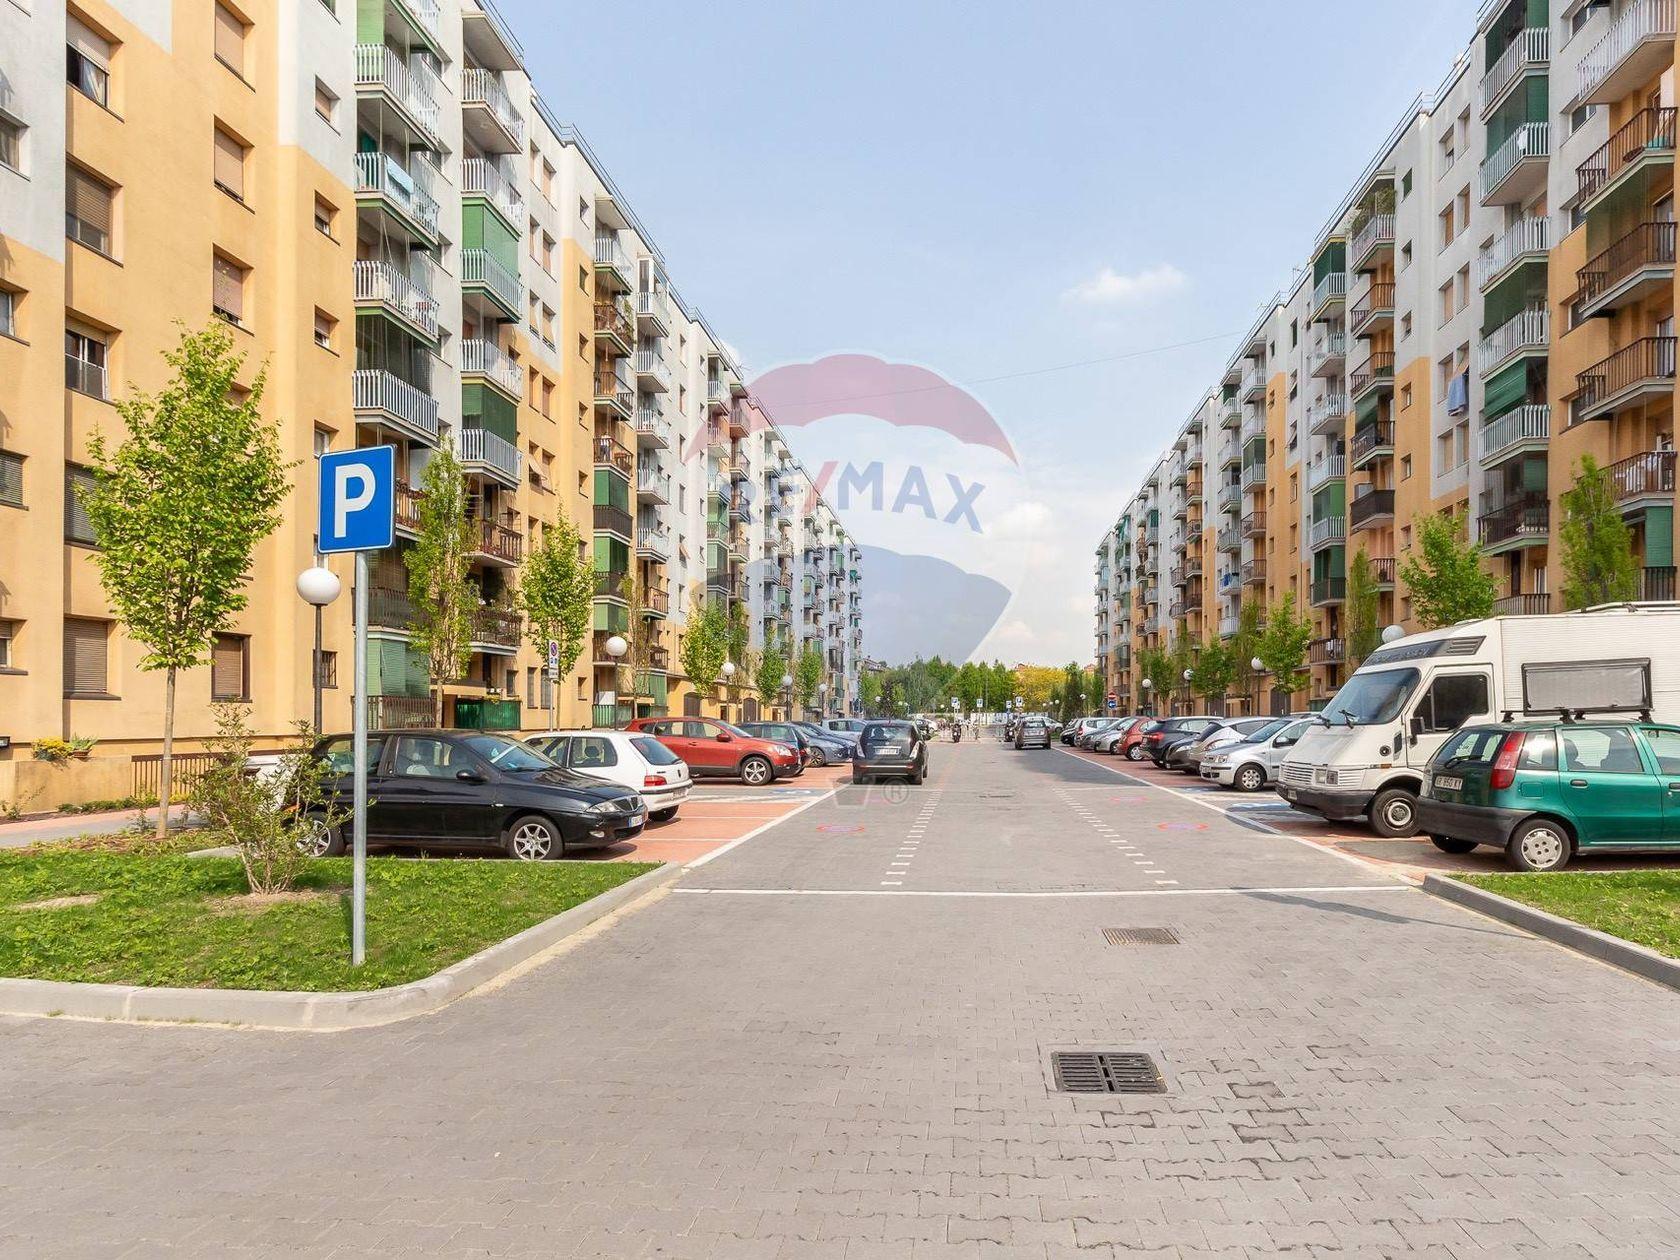 Appartamento Milano-certosa Quarto Oggiaro Villapizzone, Milano, MI Vendita - Foto 22